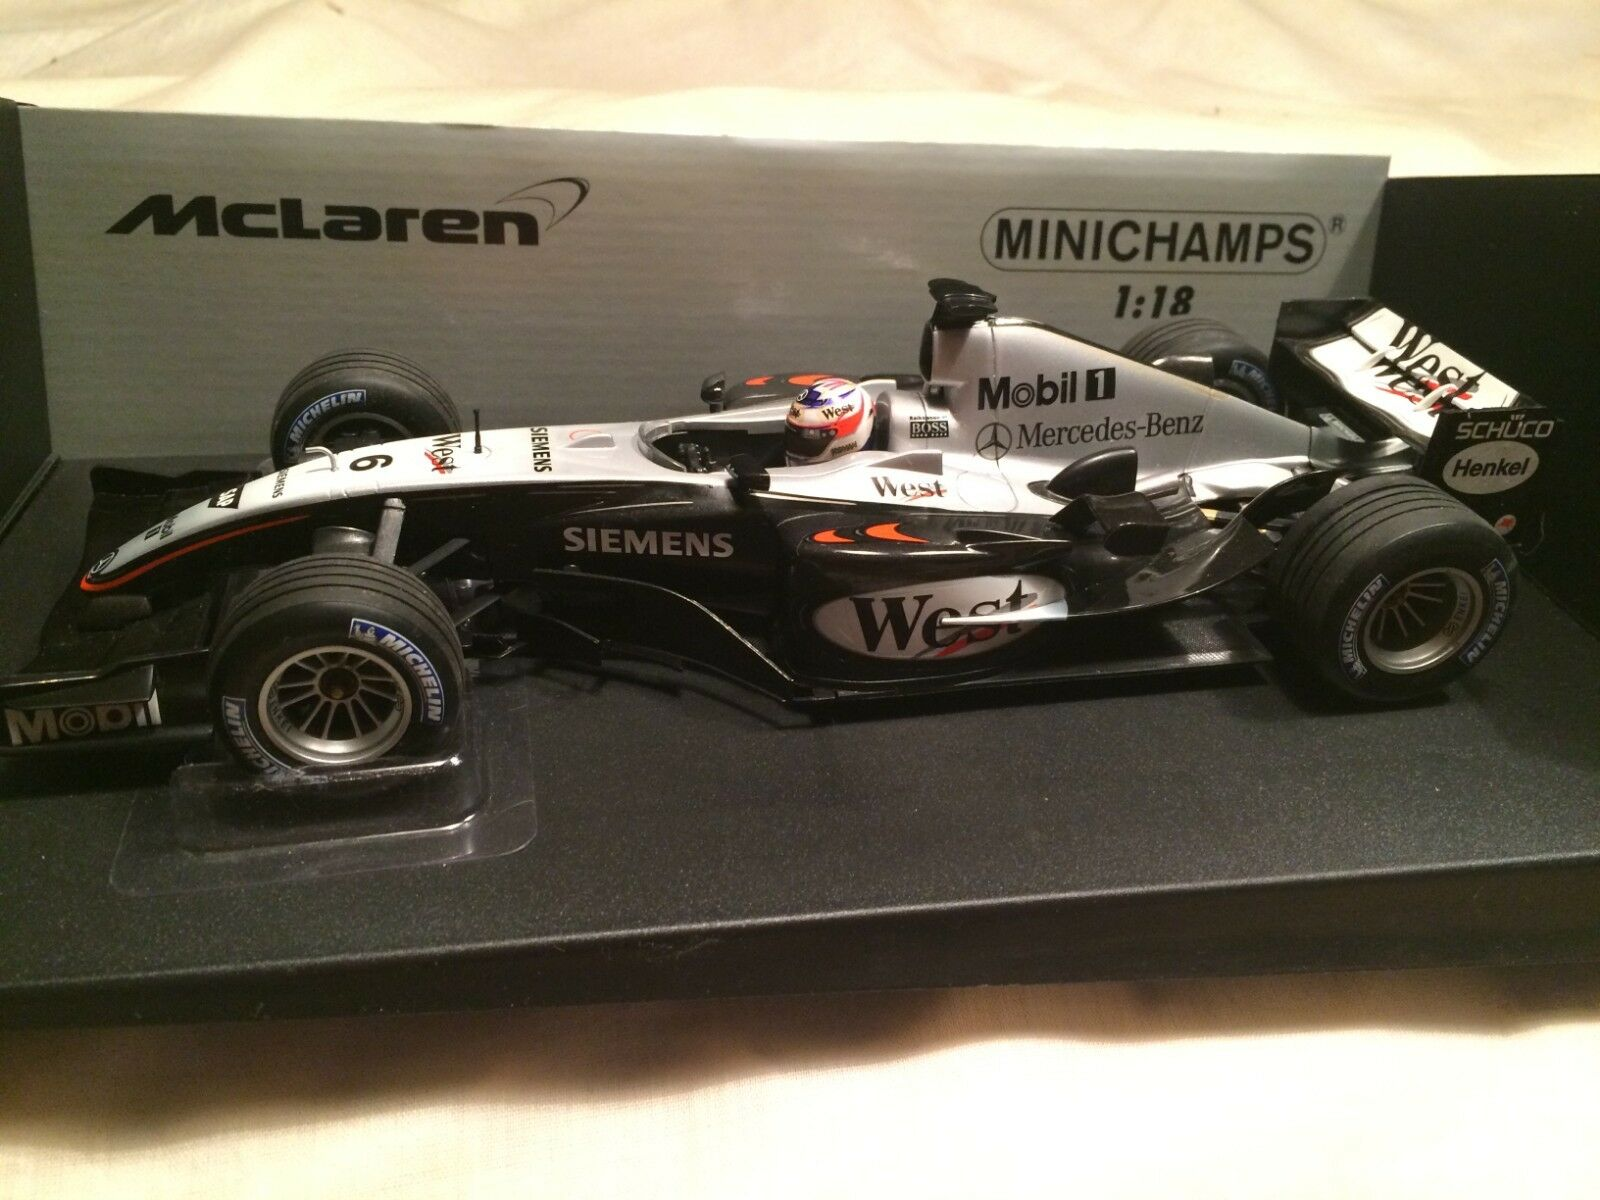 McLaren Mercedes MP4 19 West Team Edition Raikkonen Minichamps 1 18 scale